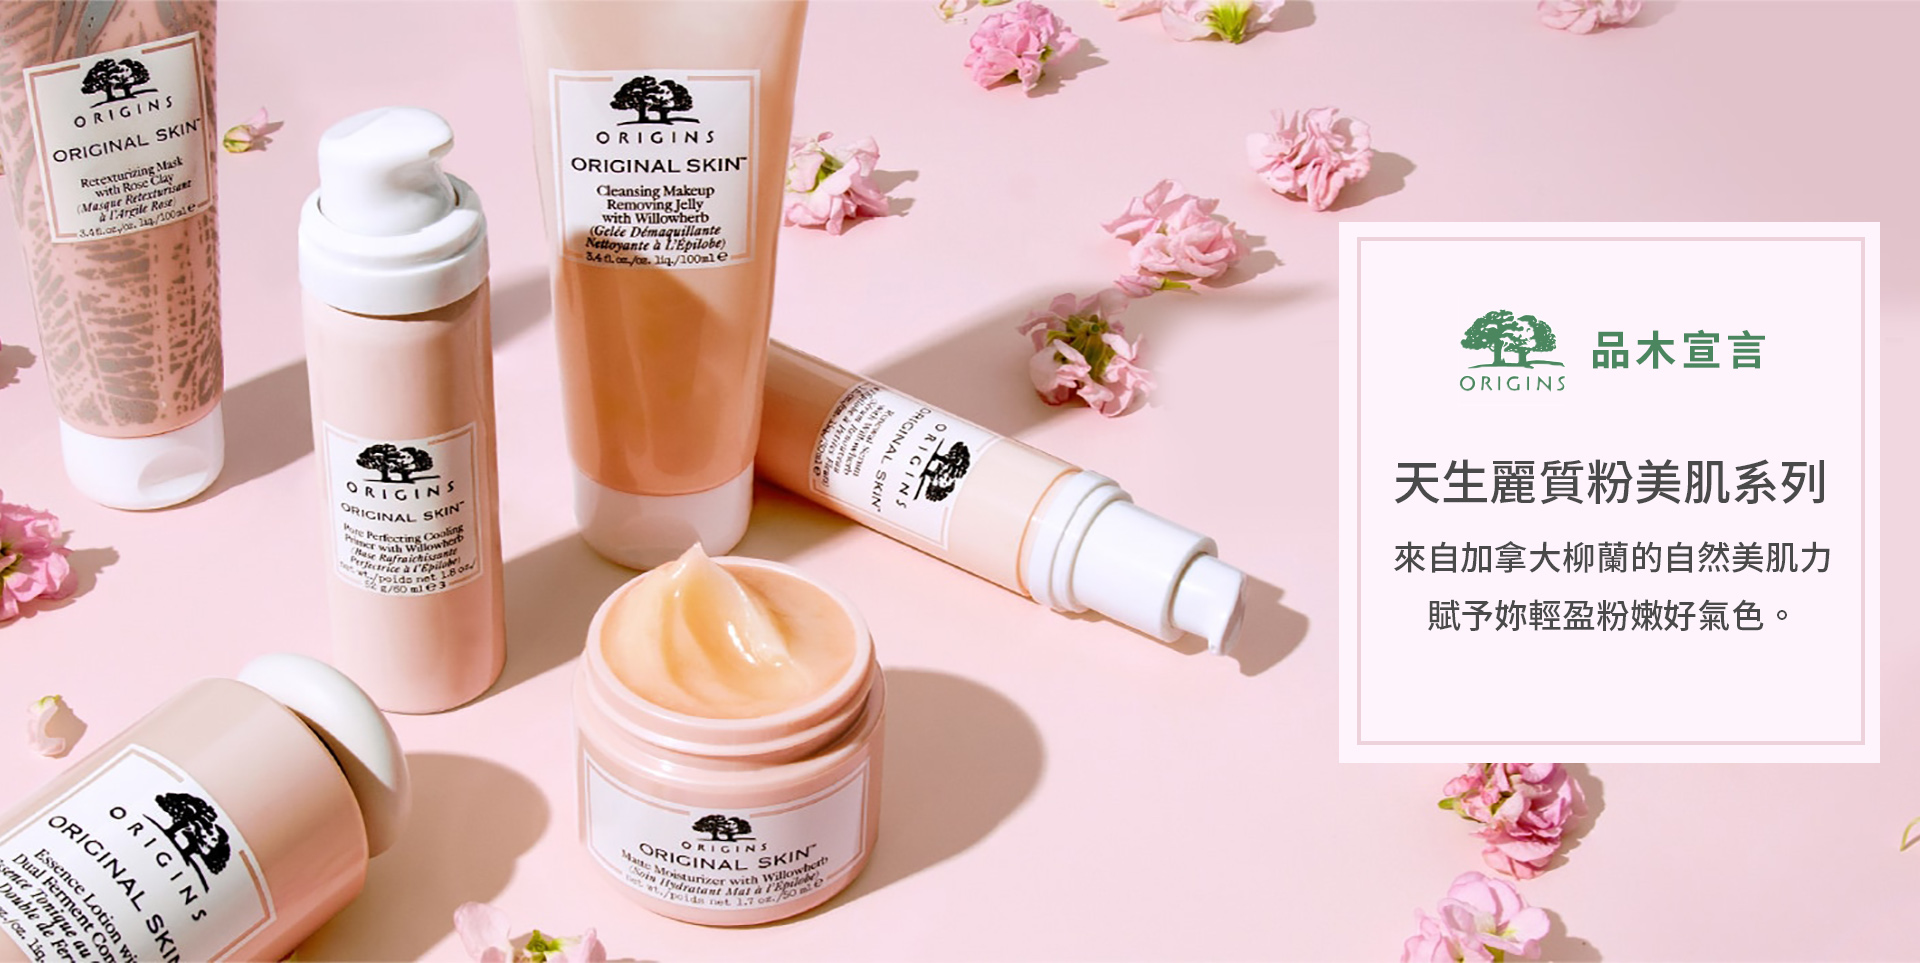 Origins 品木宣言 天生麗質粉美肌系列